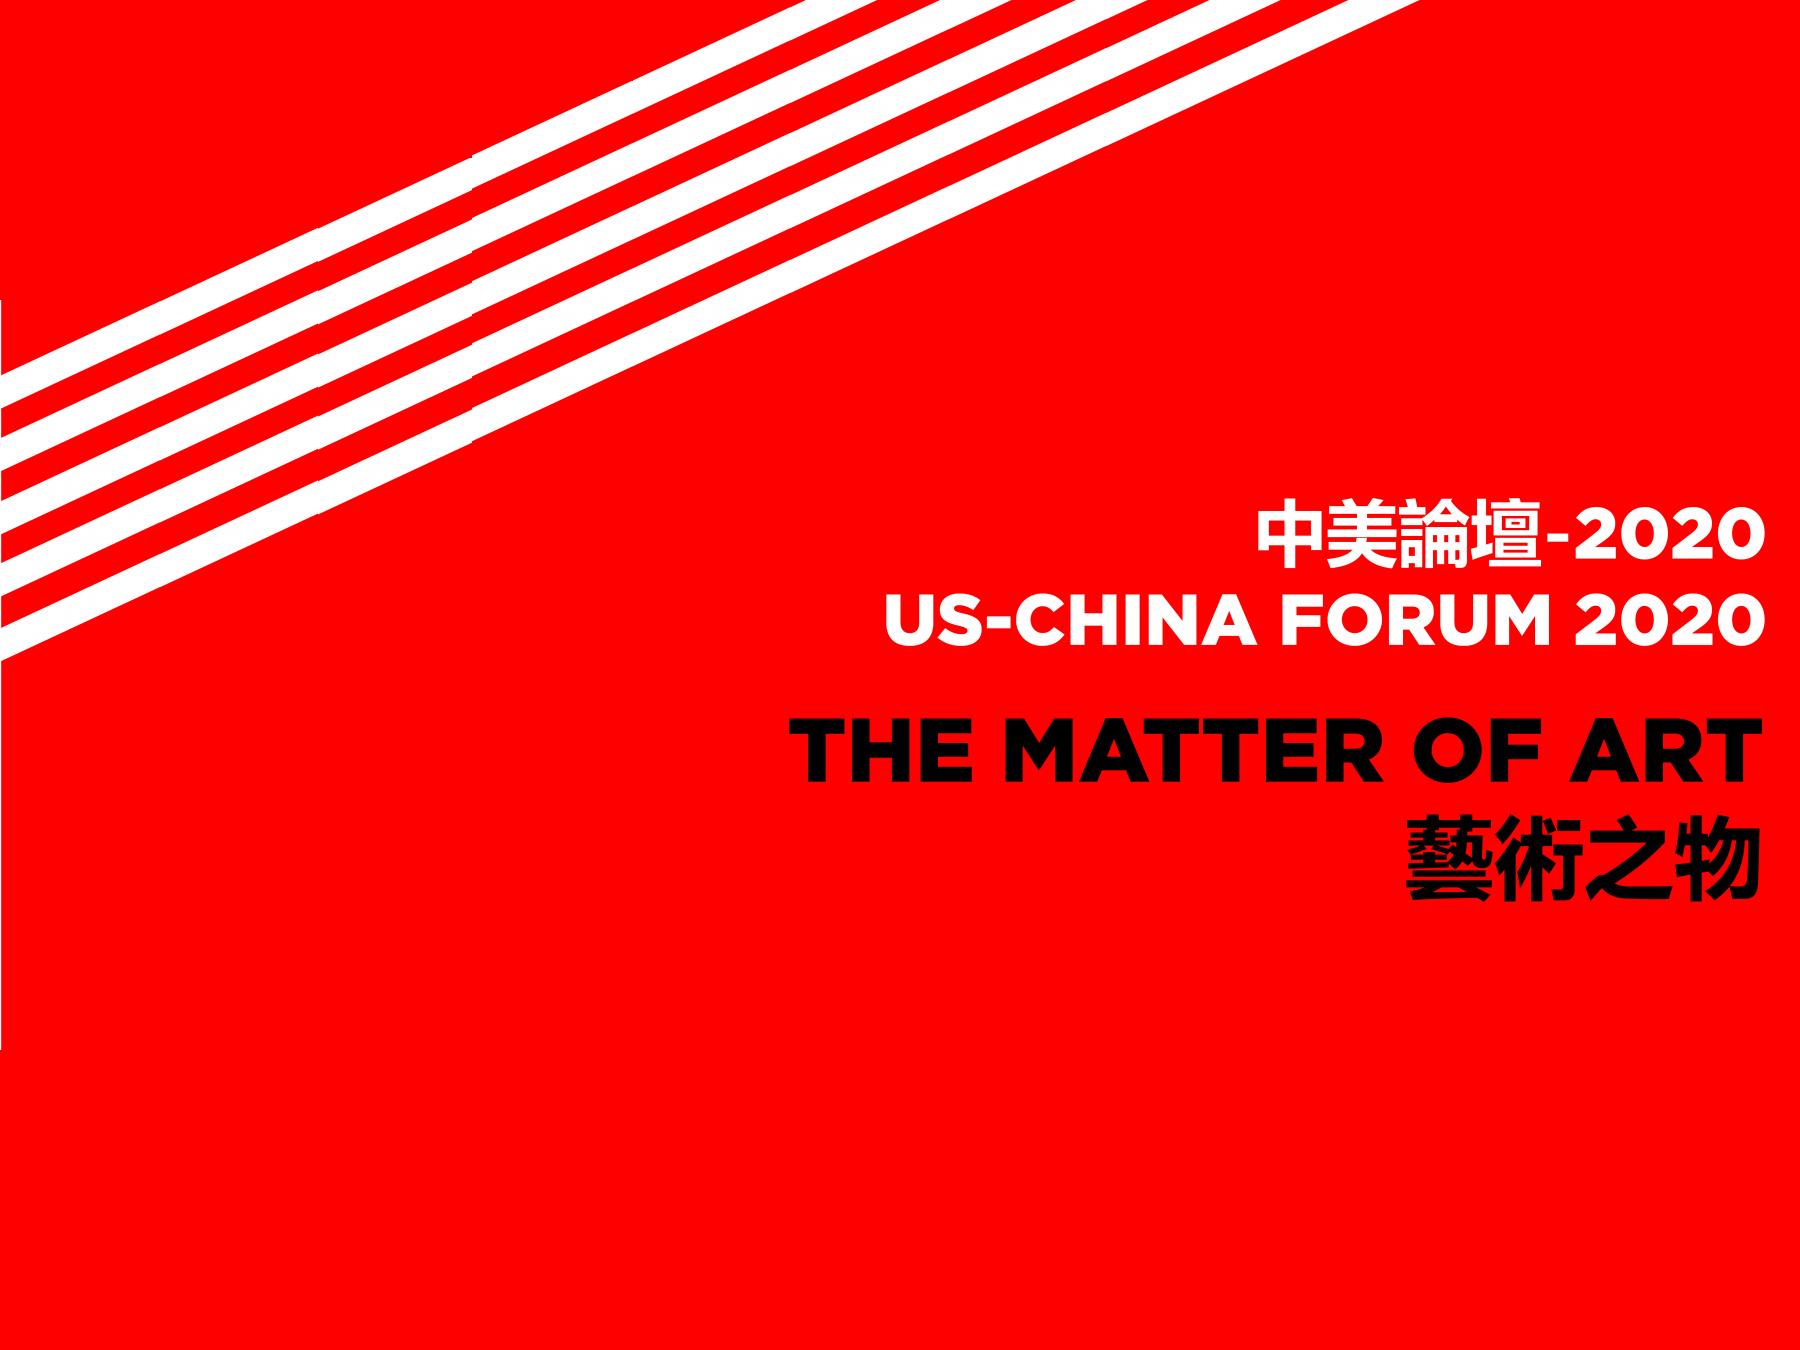 US-China Forum 2020: The Matter of Art